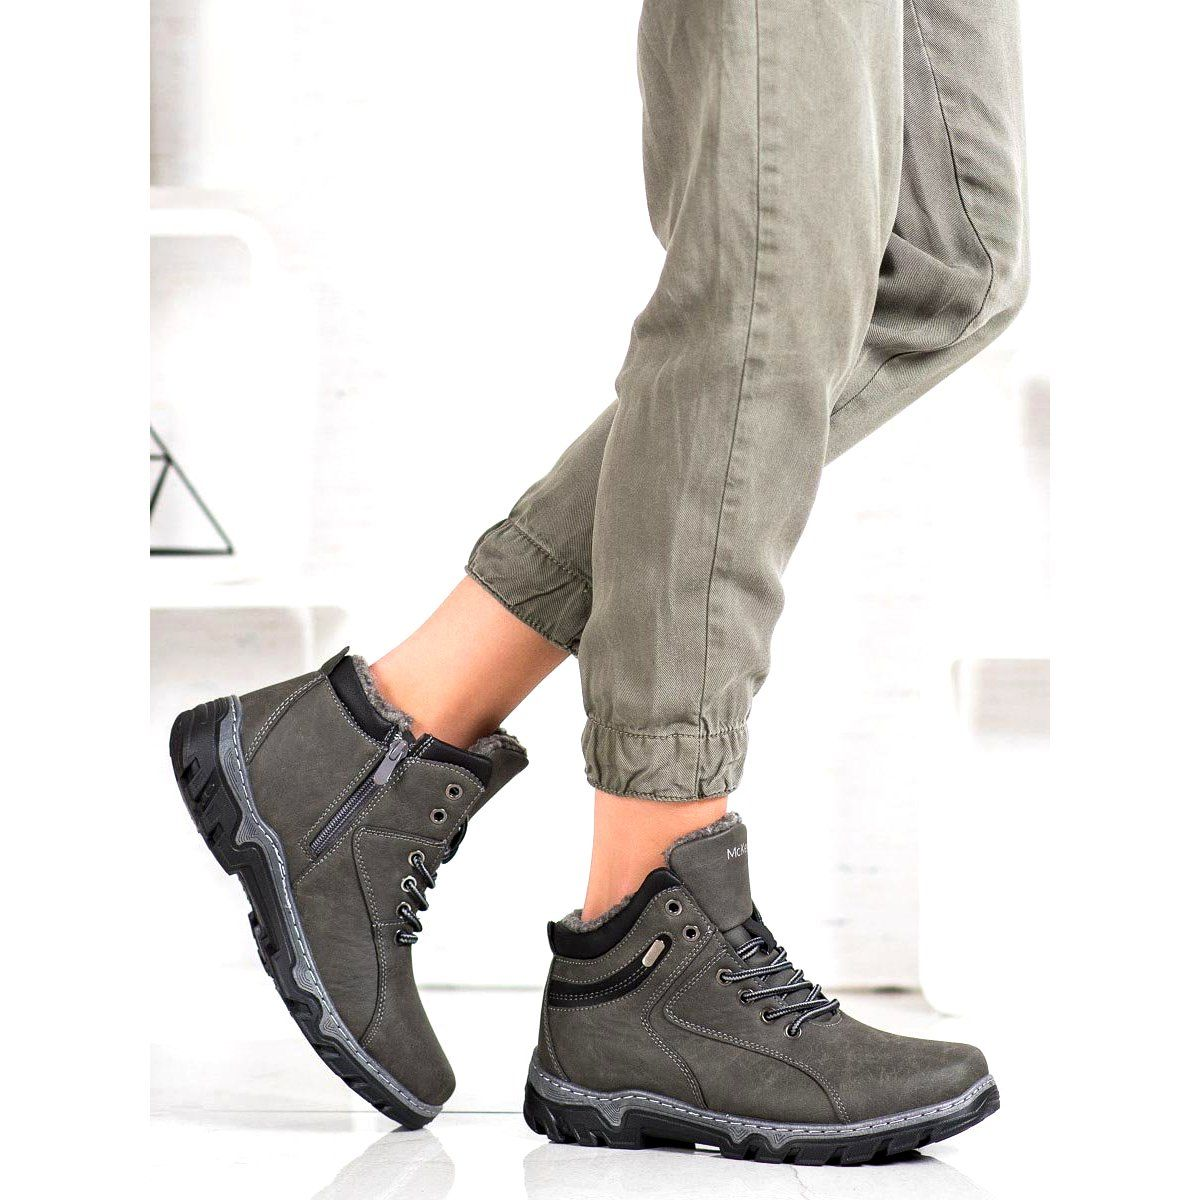 Trekkingowe Damskie Mckeylor Ocieplane Buty Mckeylor Szare Pocket Jeans Wedge Sneaker Fashion